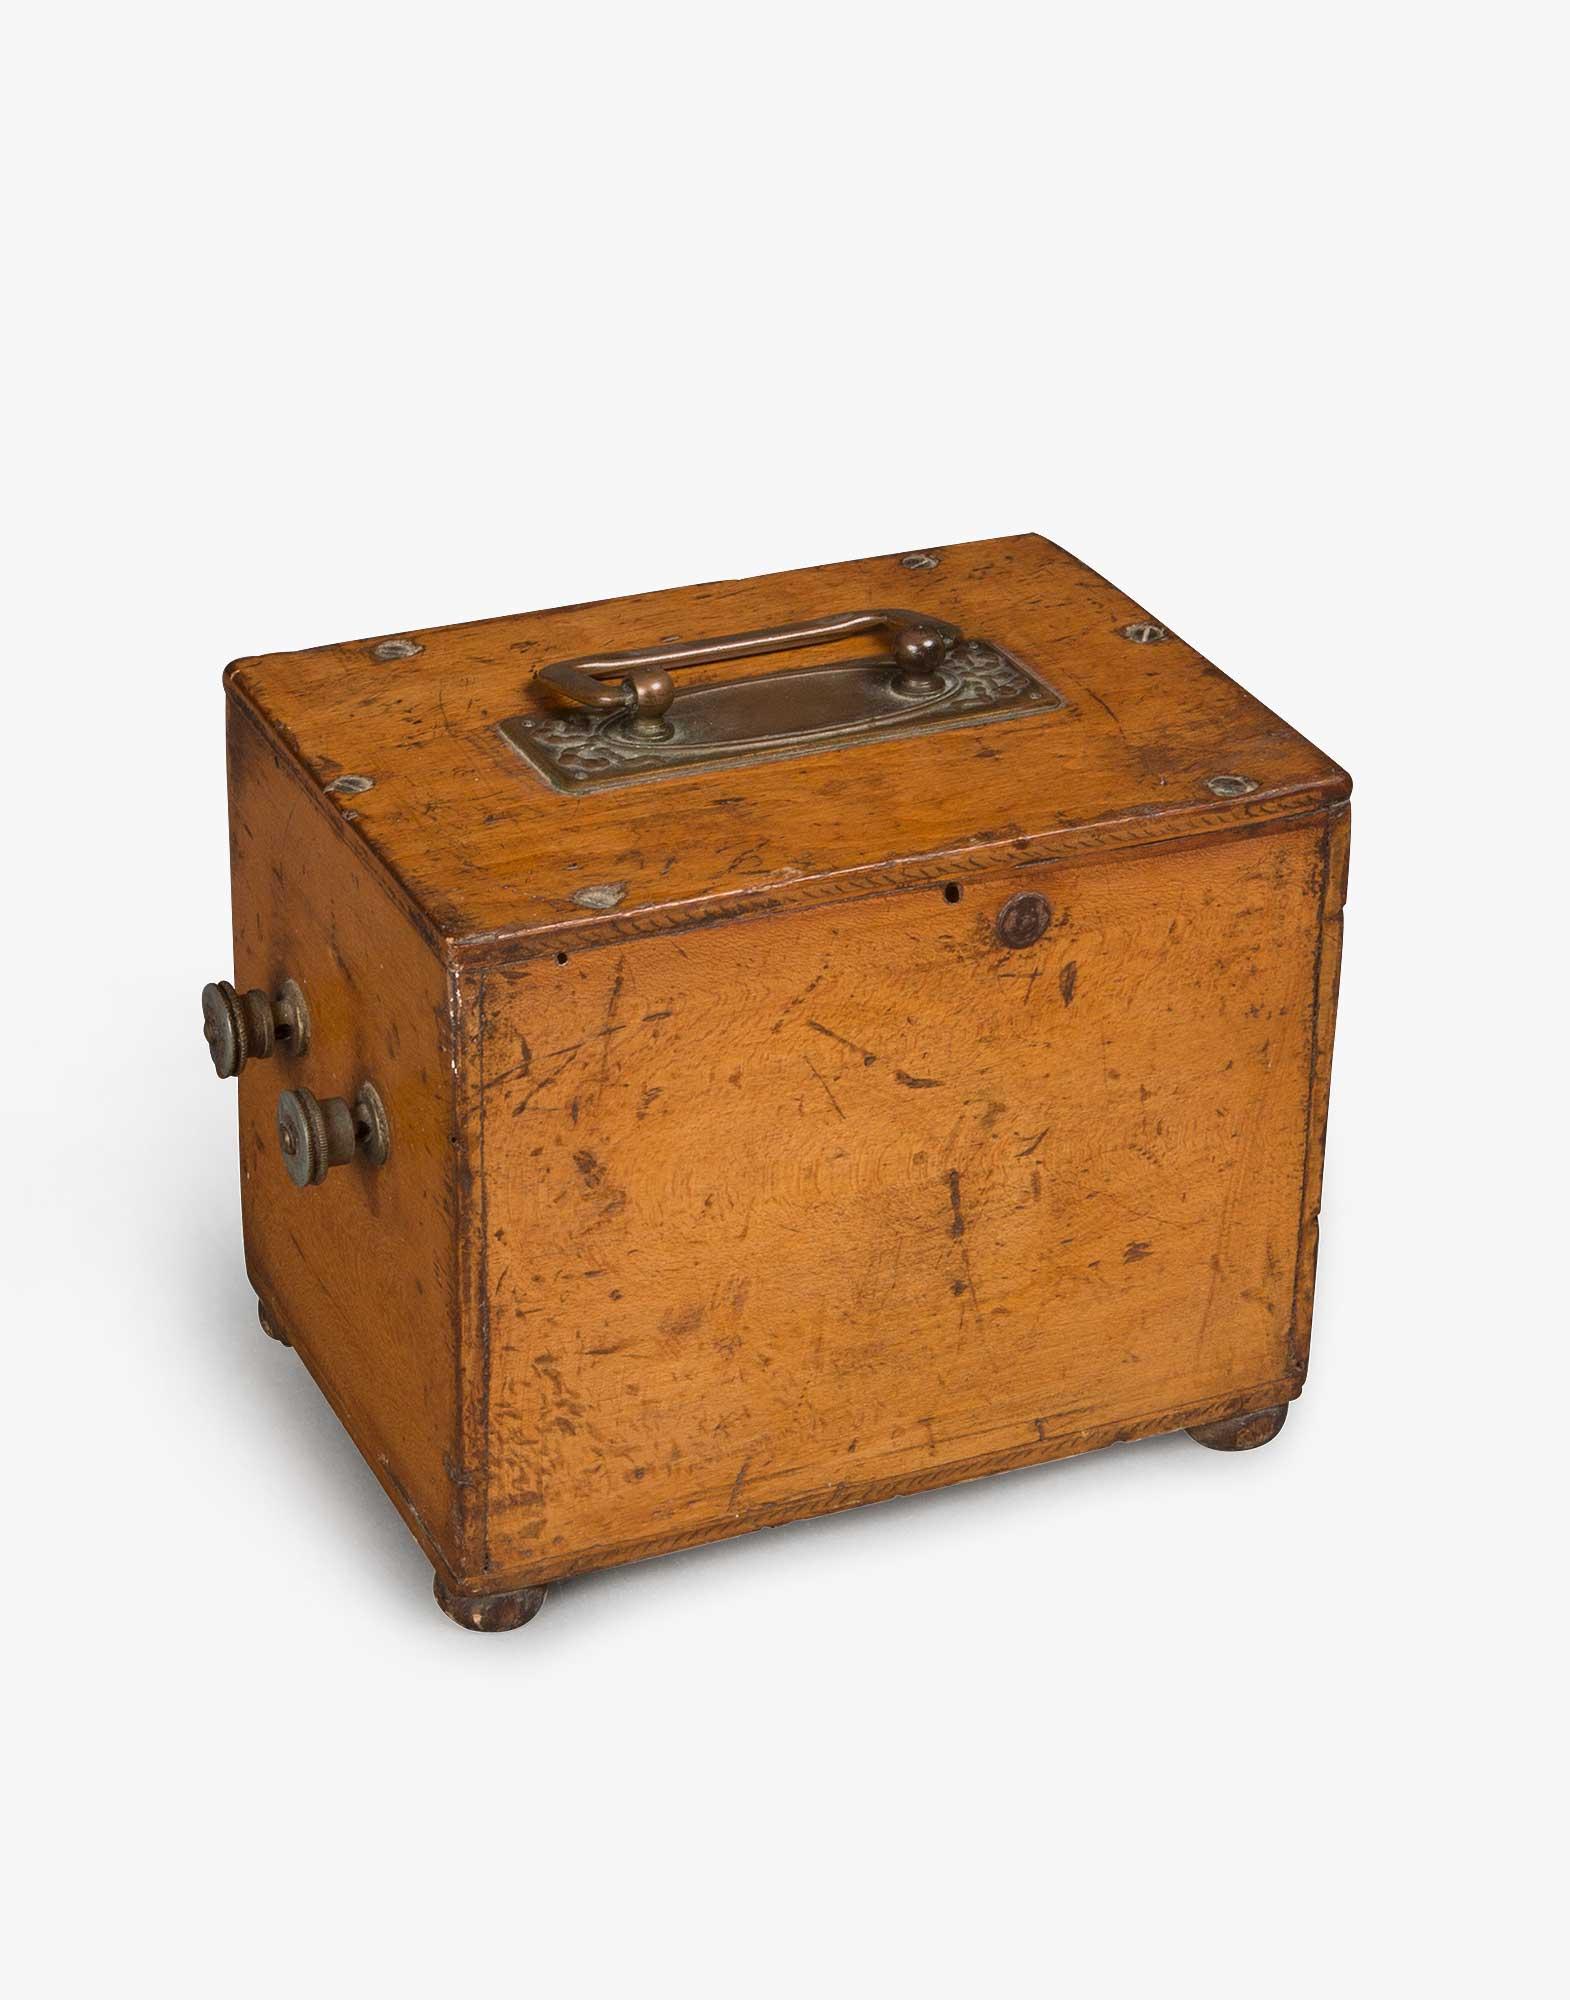 Antique Magneto Box